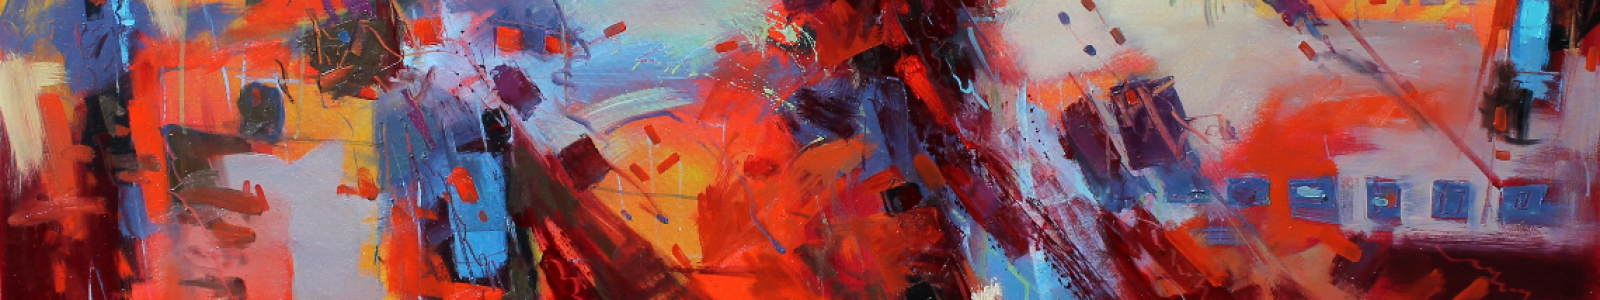 Gallery Painter Henadzy Havartsou